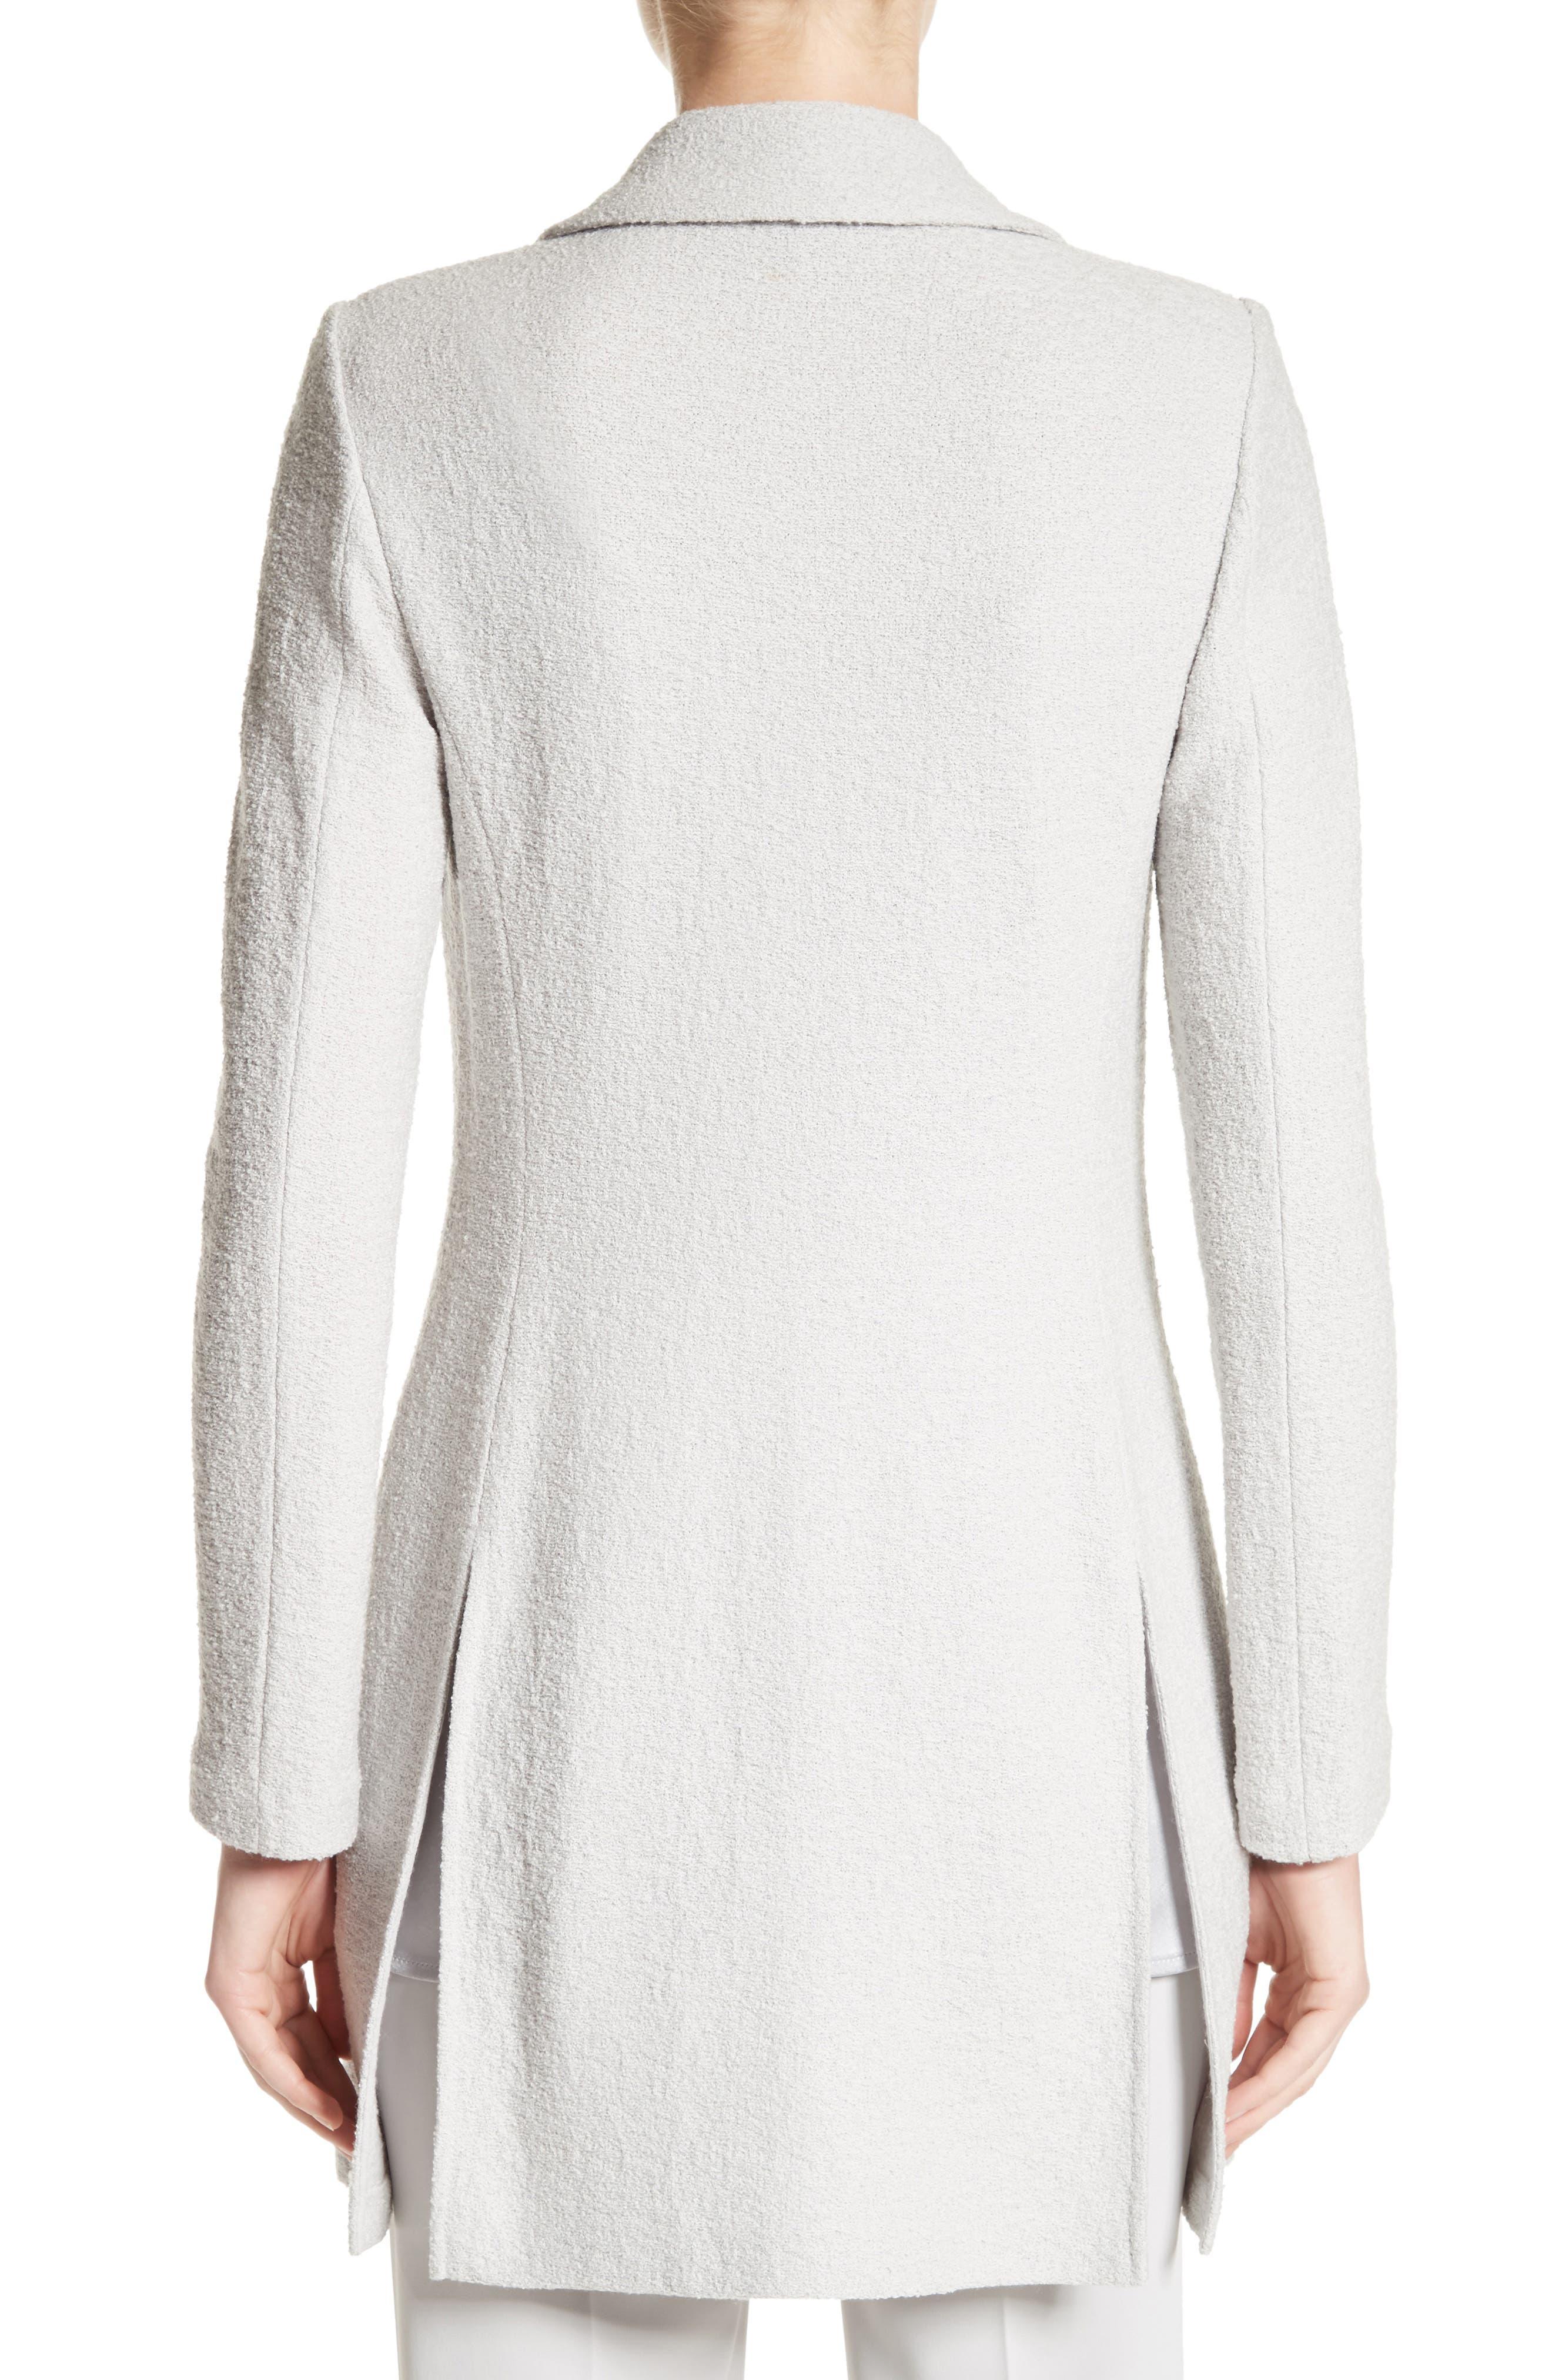 Alternate Image 2  - St. John Collection Clair Knit Jacket